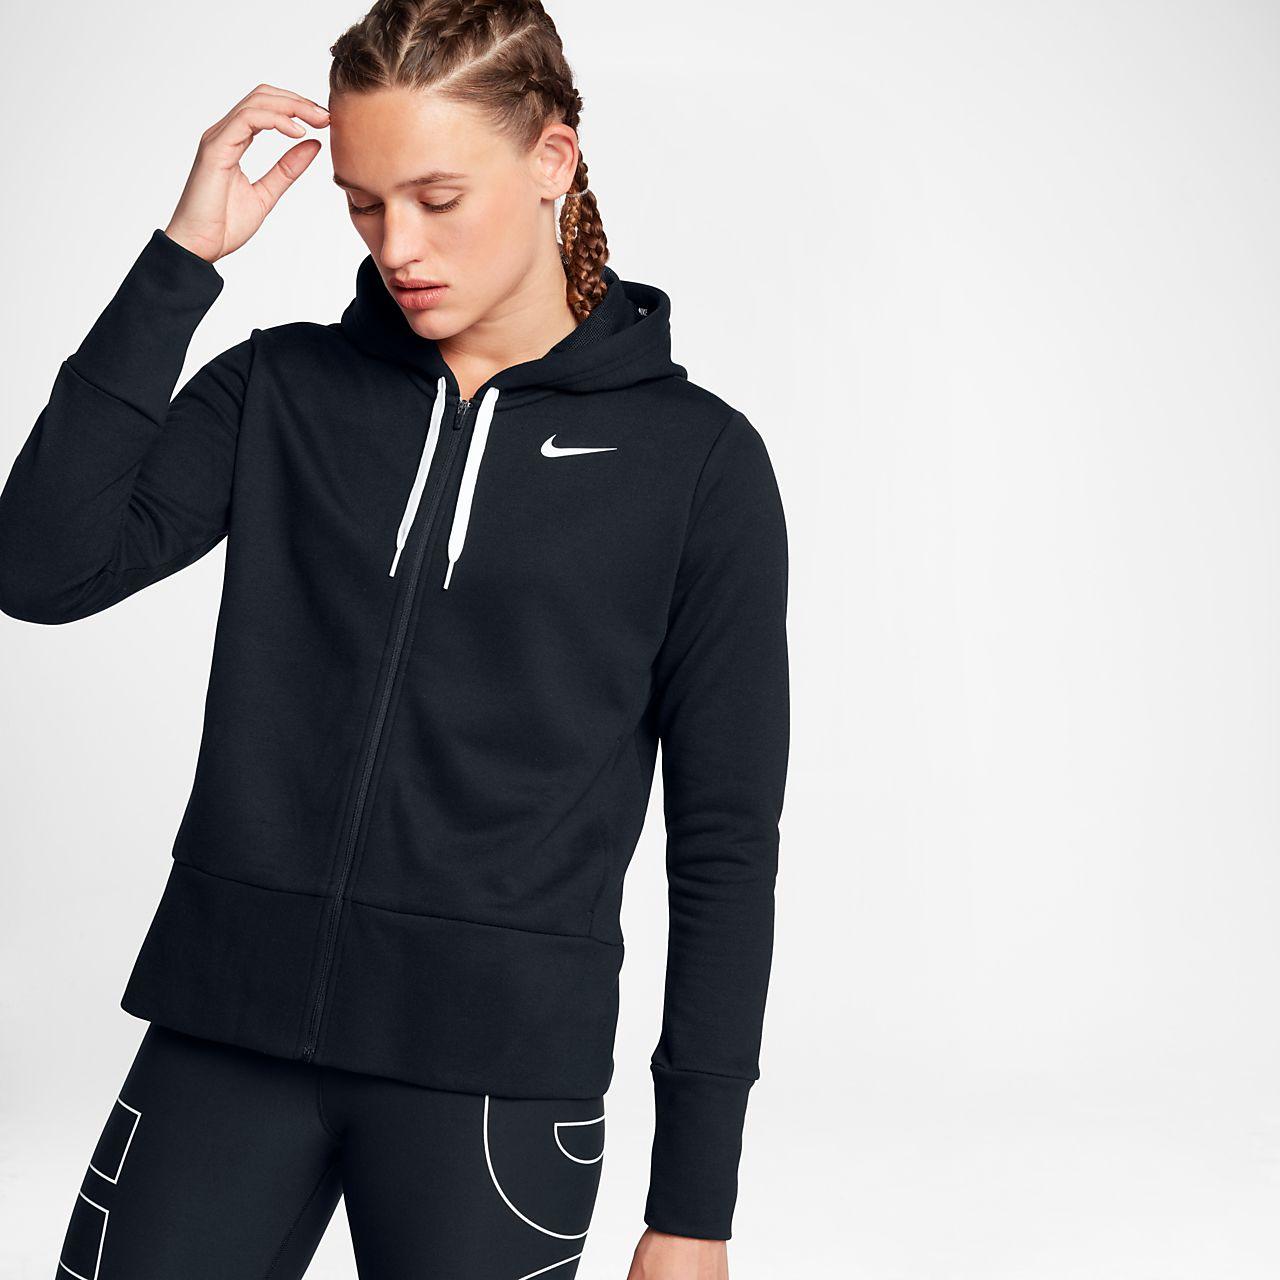 ... Nike Dri-FIT Women's Training Hoodie